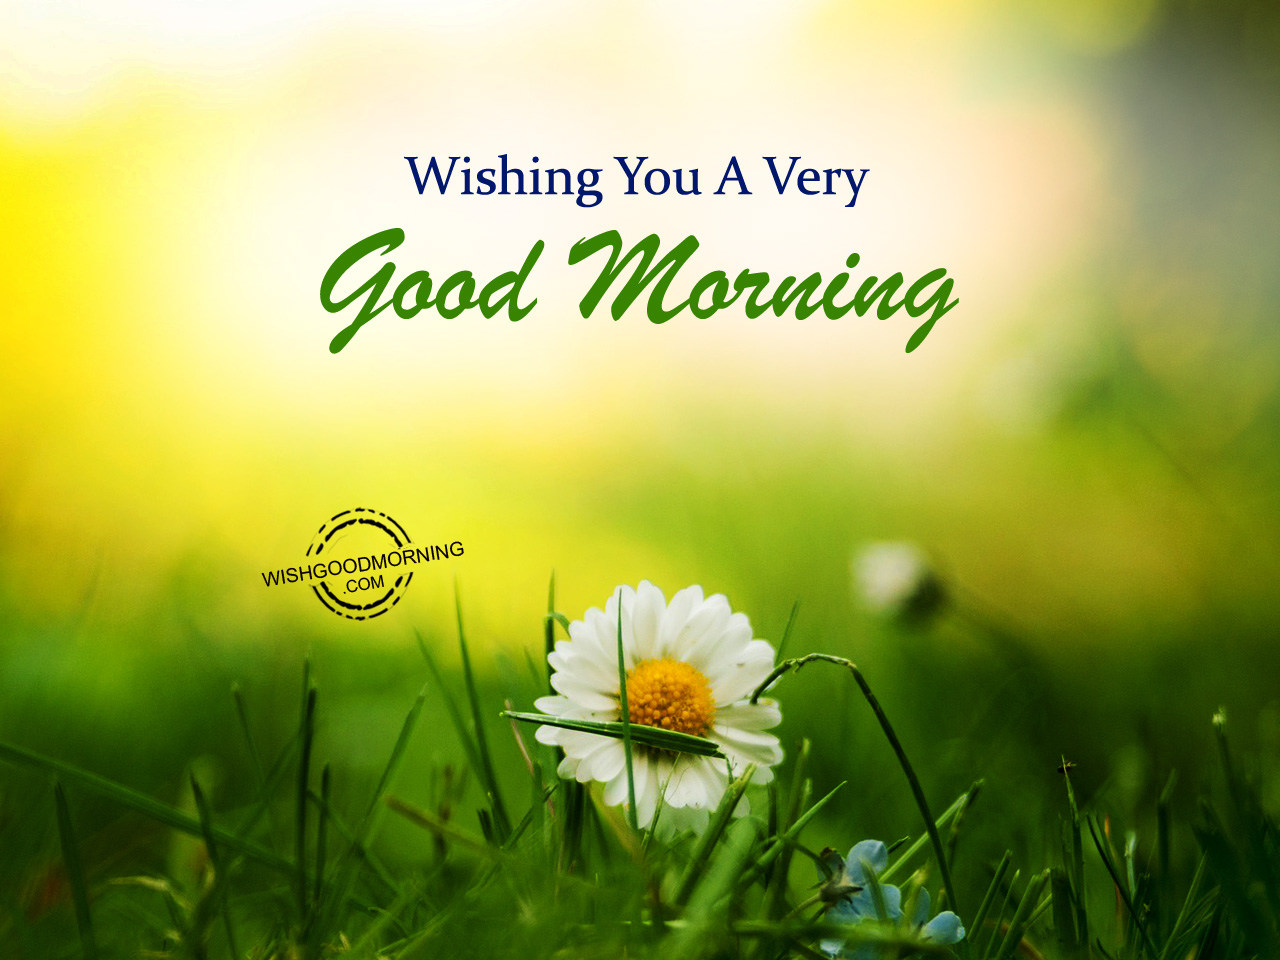 Wishing You A Very Good Morning